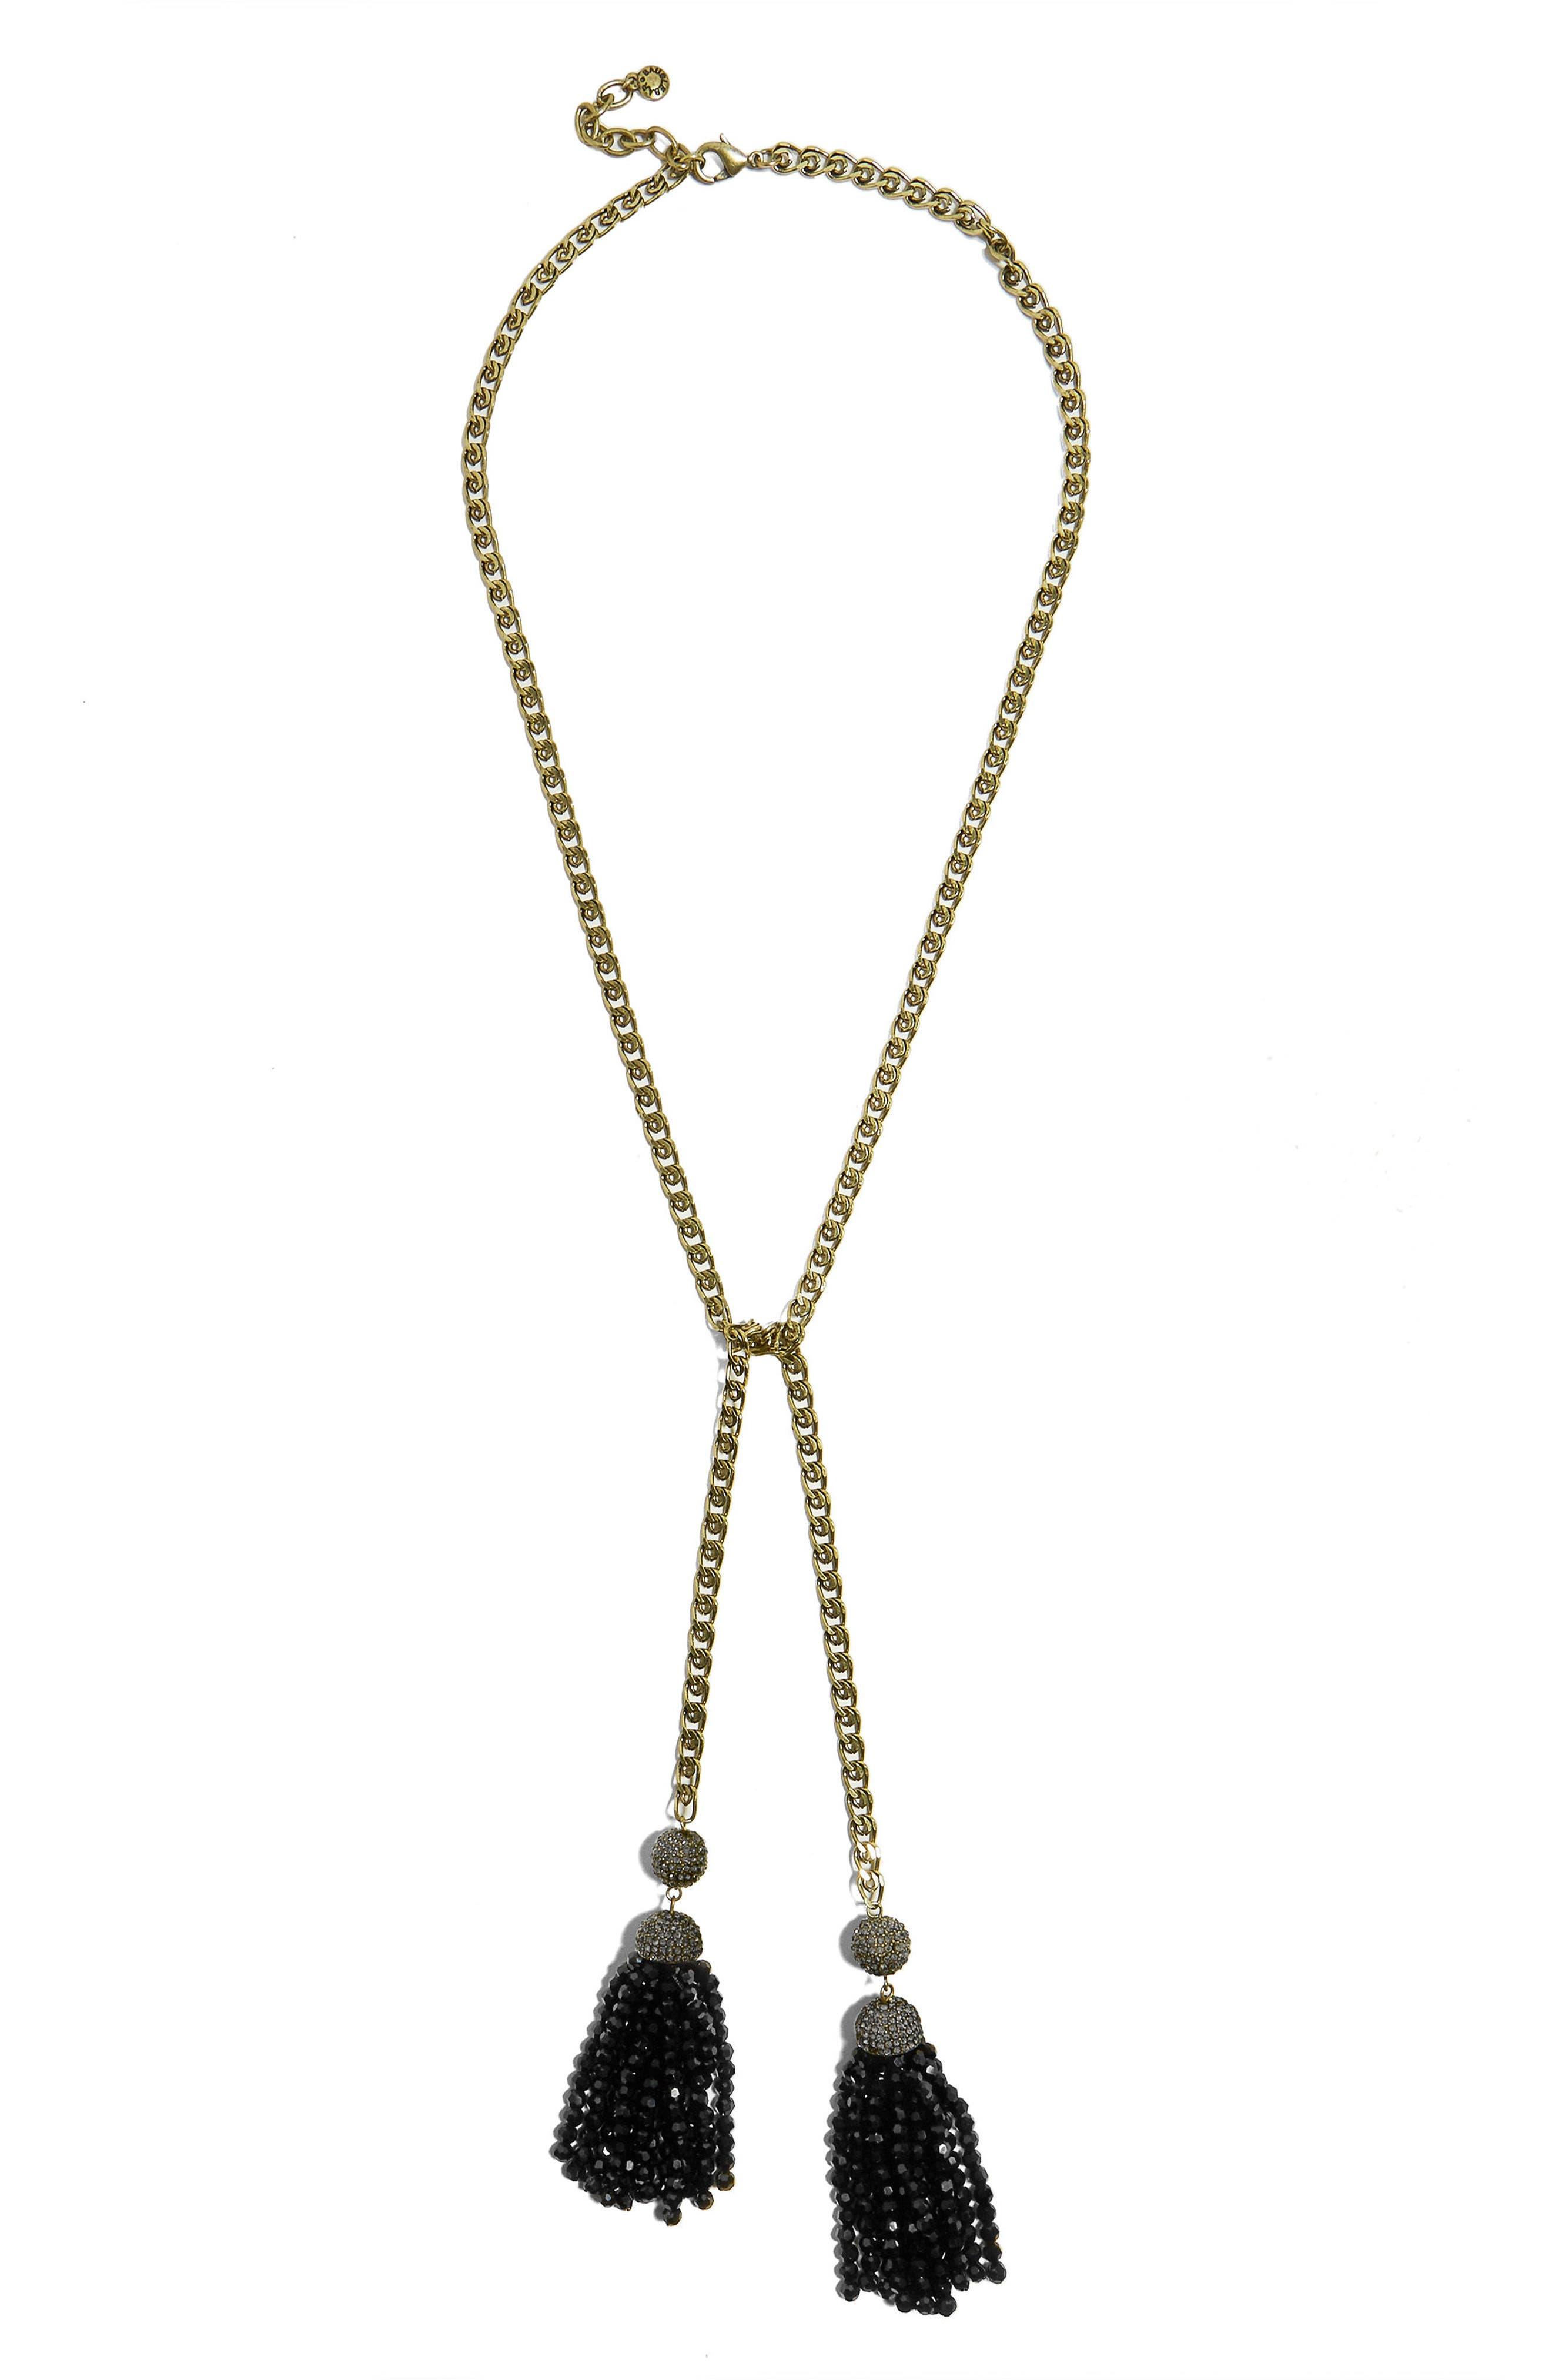 Main Image - BaubleBar Tinsley Lariat Tassel Necklace